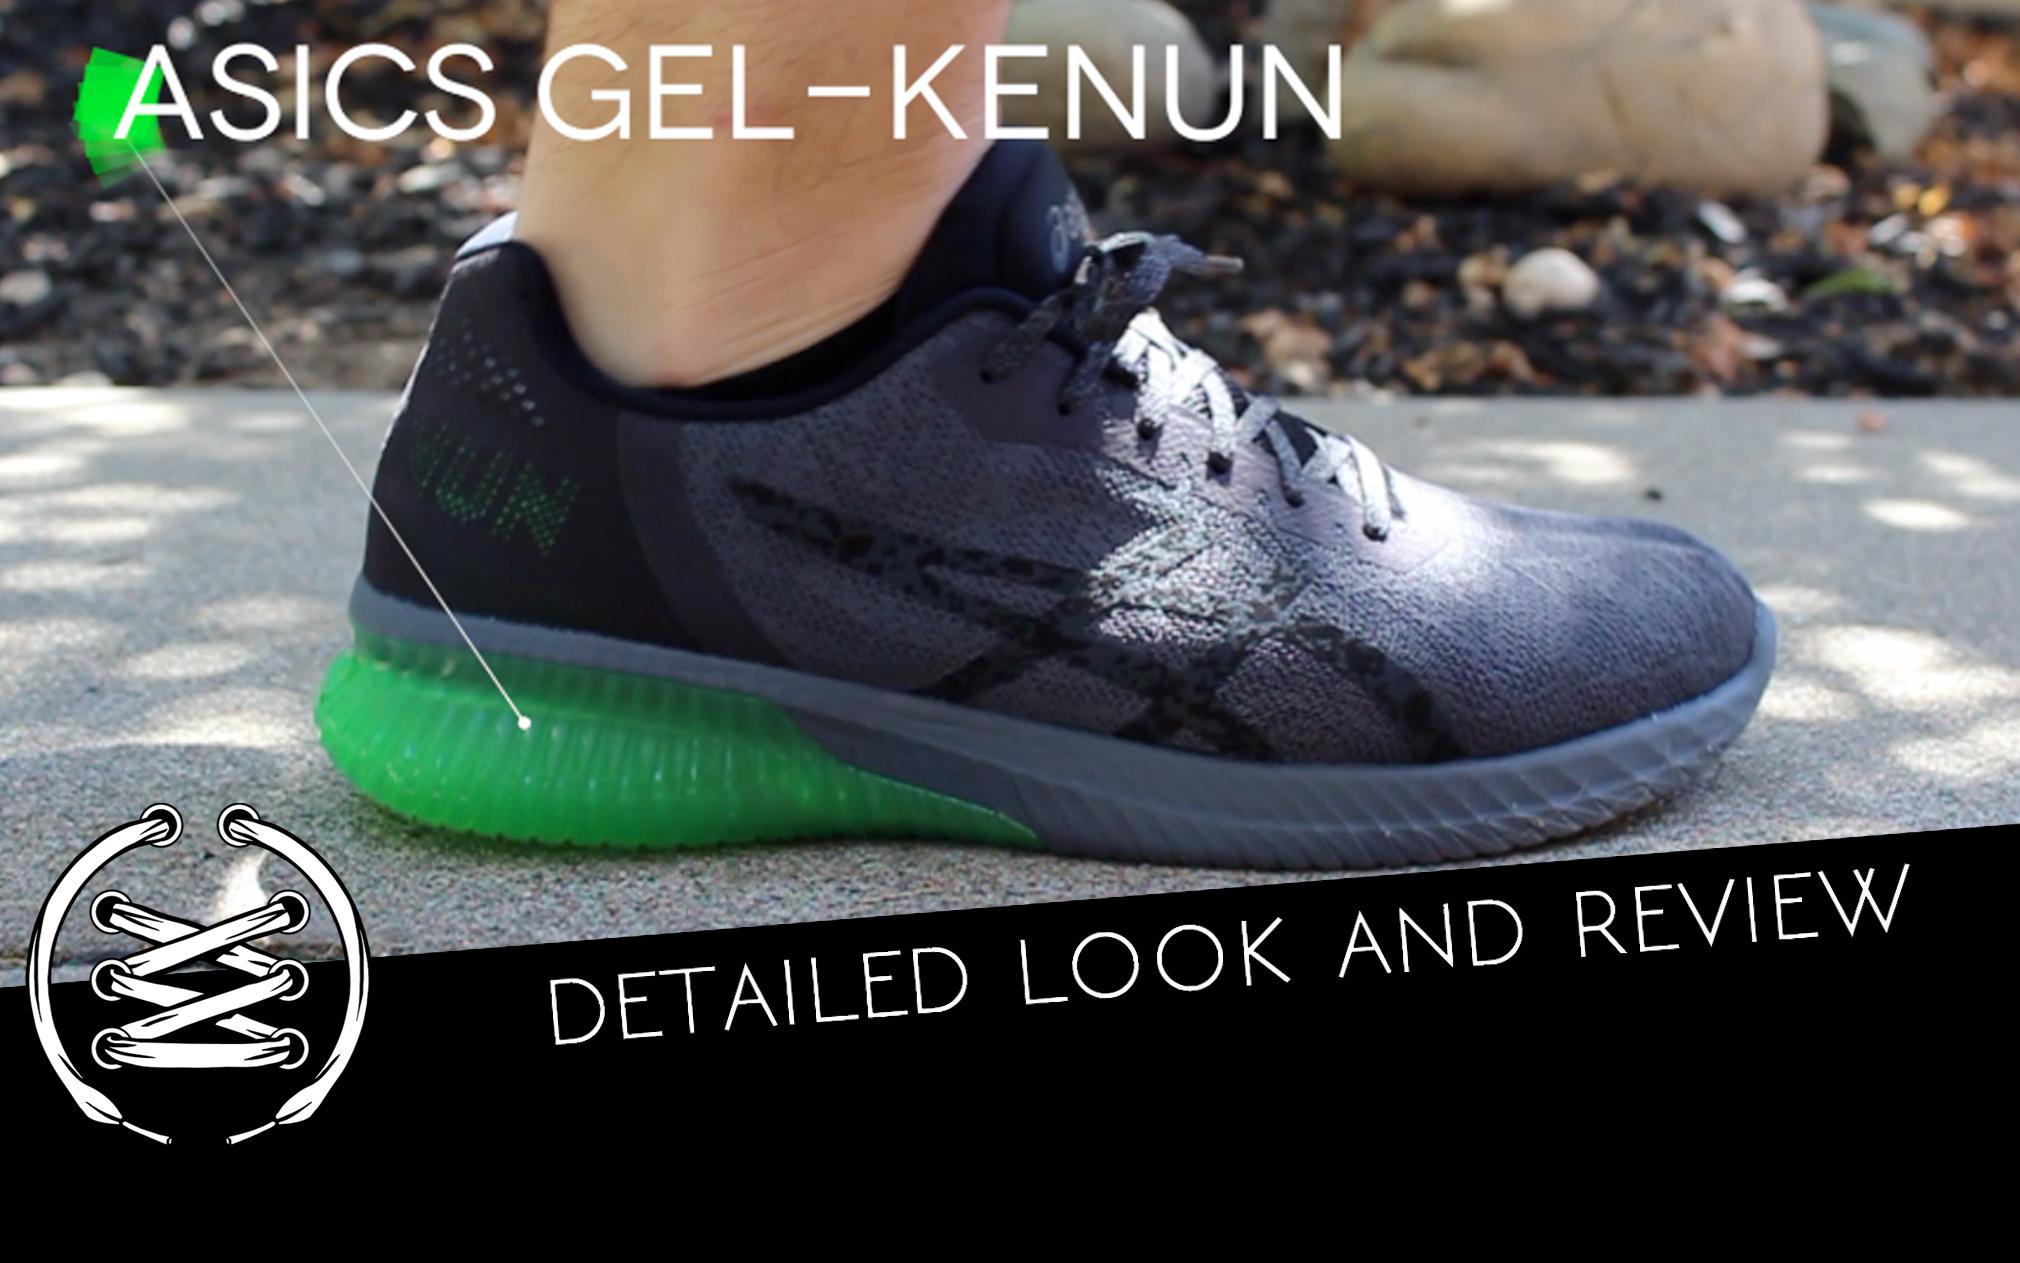 Asics 16668 Gel Gel Kenun | | 4f80e1d - shorttermhealthinsurance.website